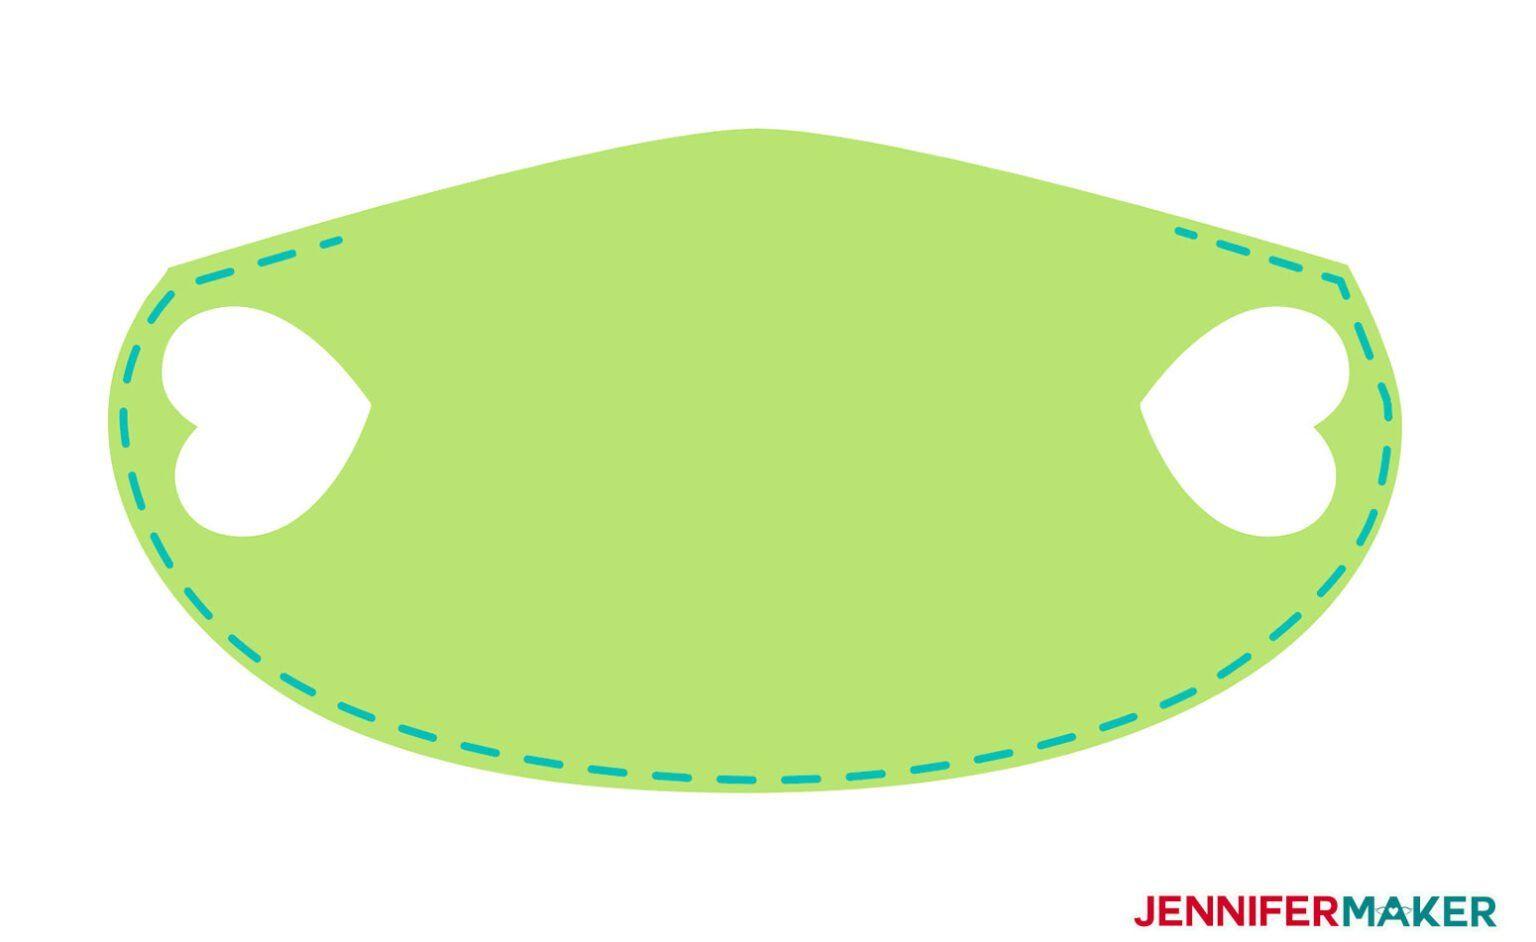 Make a No-Sew Face Mask From a T-Shirt! - Jennifer Maker